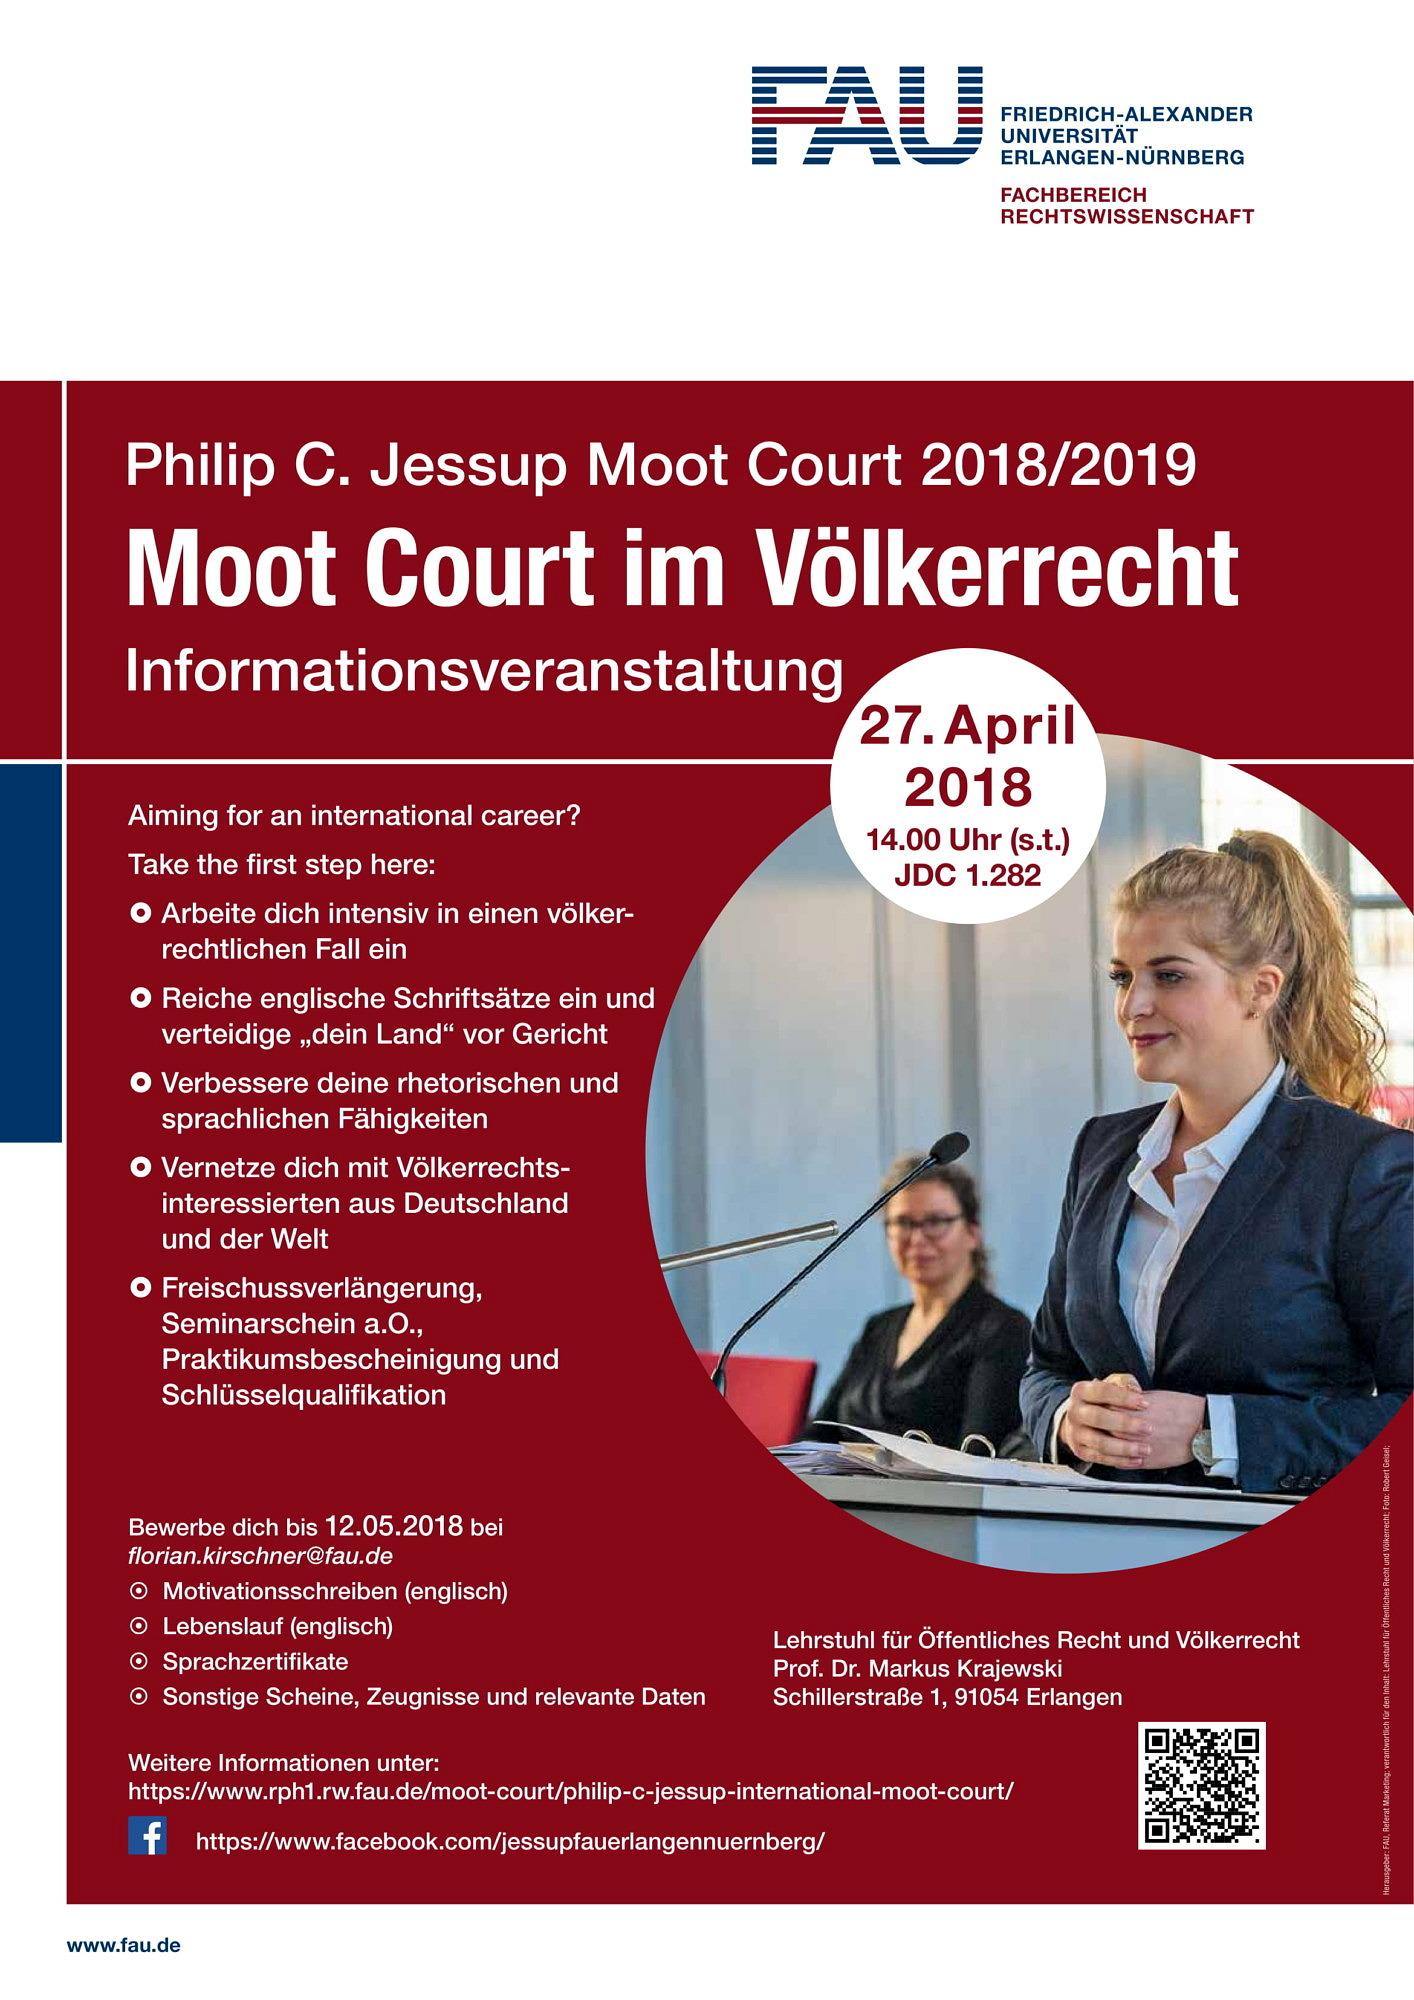 Moot Court im Völkerrecht – Informationsveranstaltung